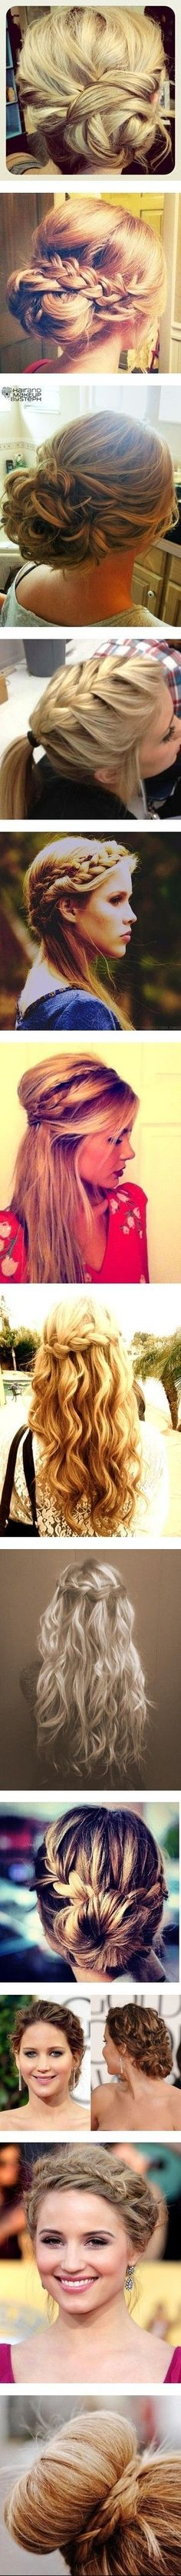 """Braided Hair Buns"" by oldrose"